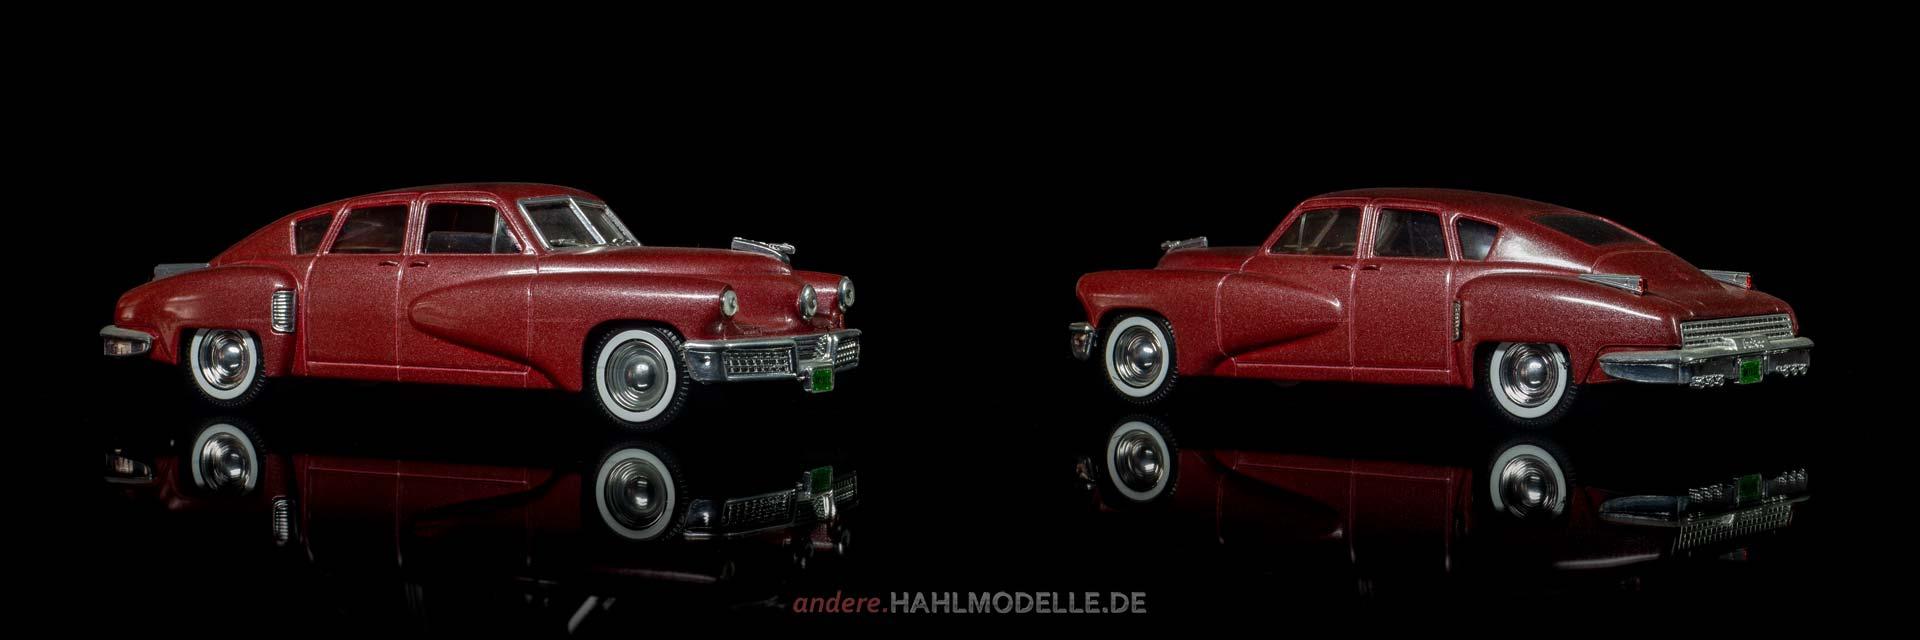 Tucker '48 | Limousine | Solido | 1:43 | www.andere.hahlmodelle.de